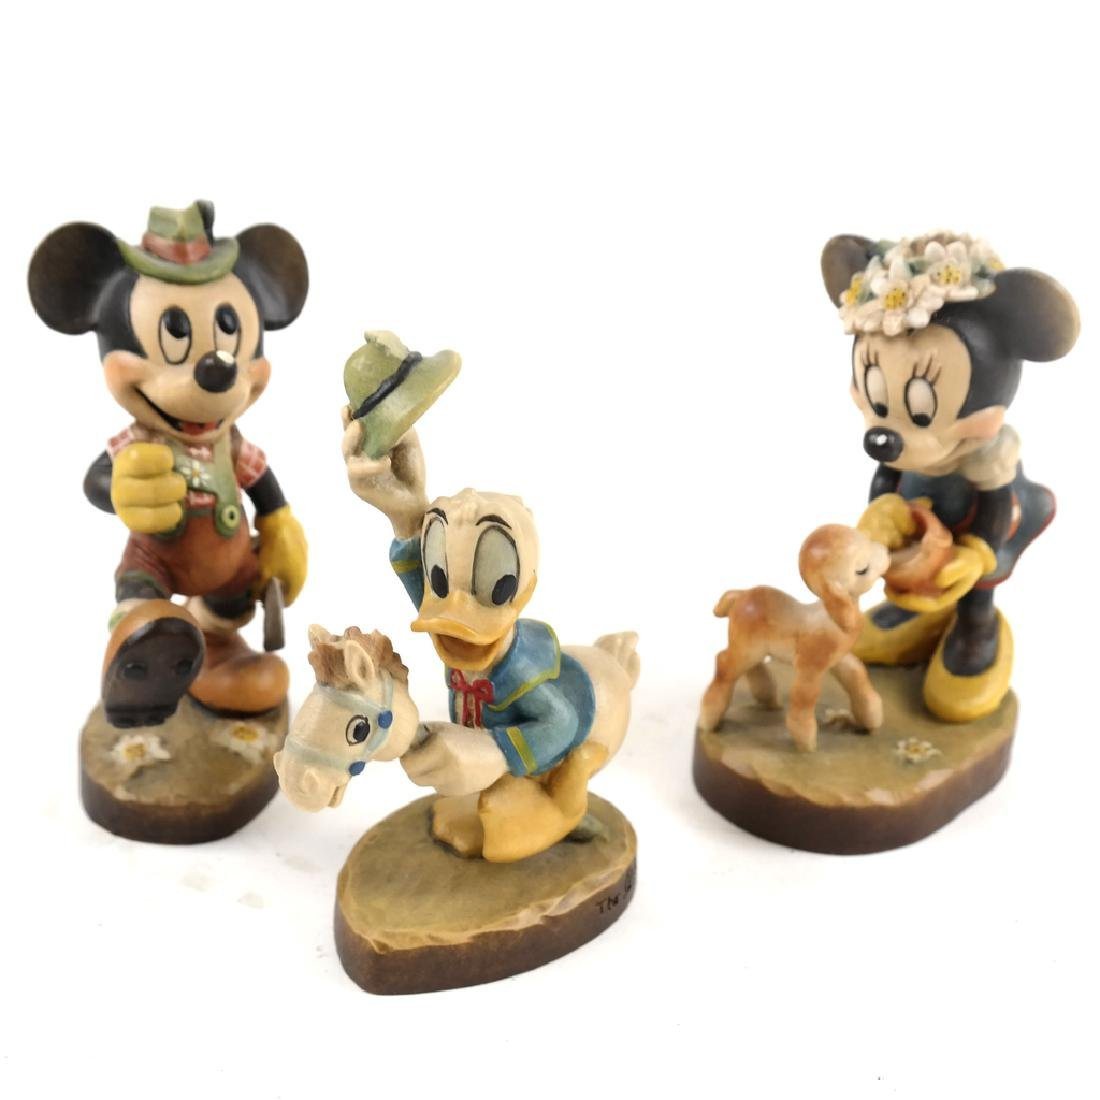 Disney Wood Figures by Anri Ulrich Bernaldi